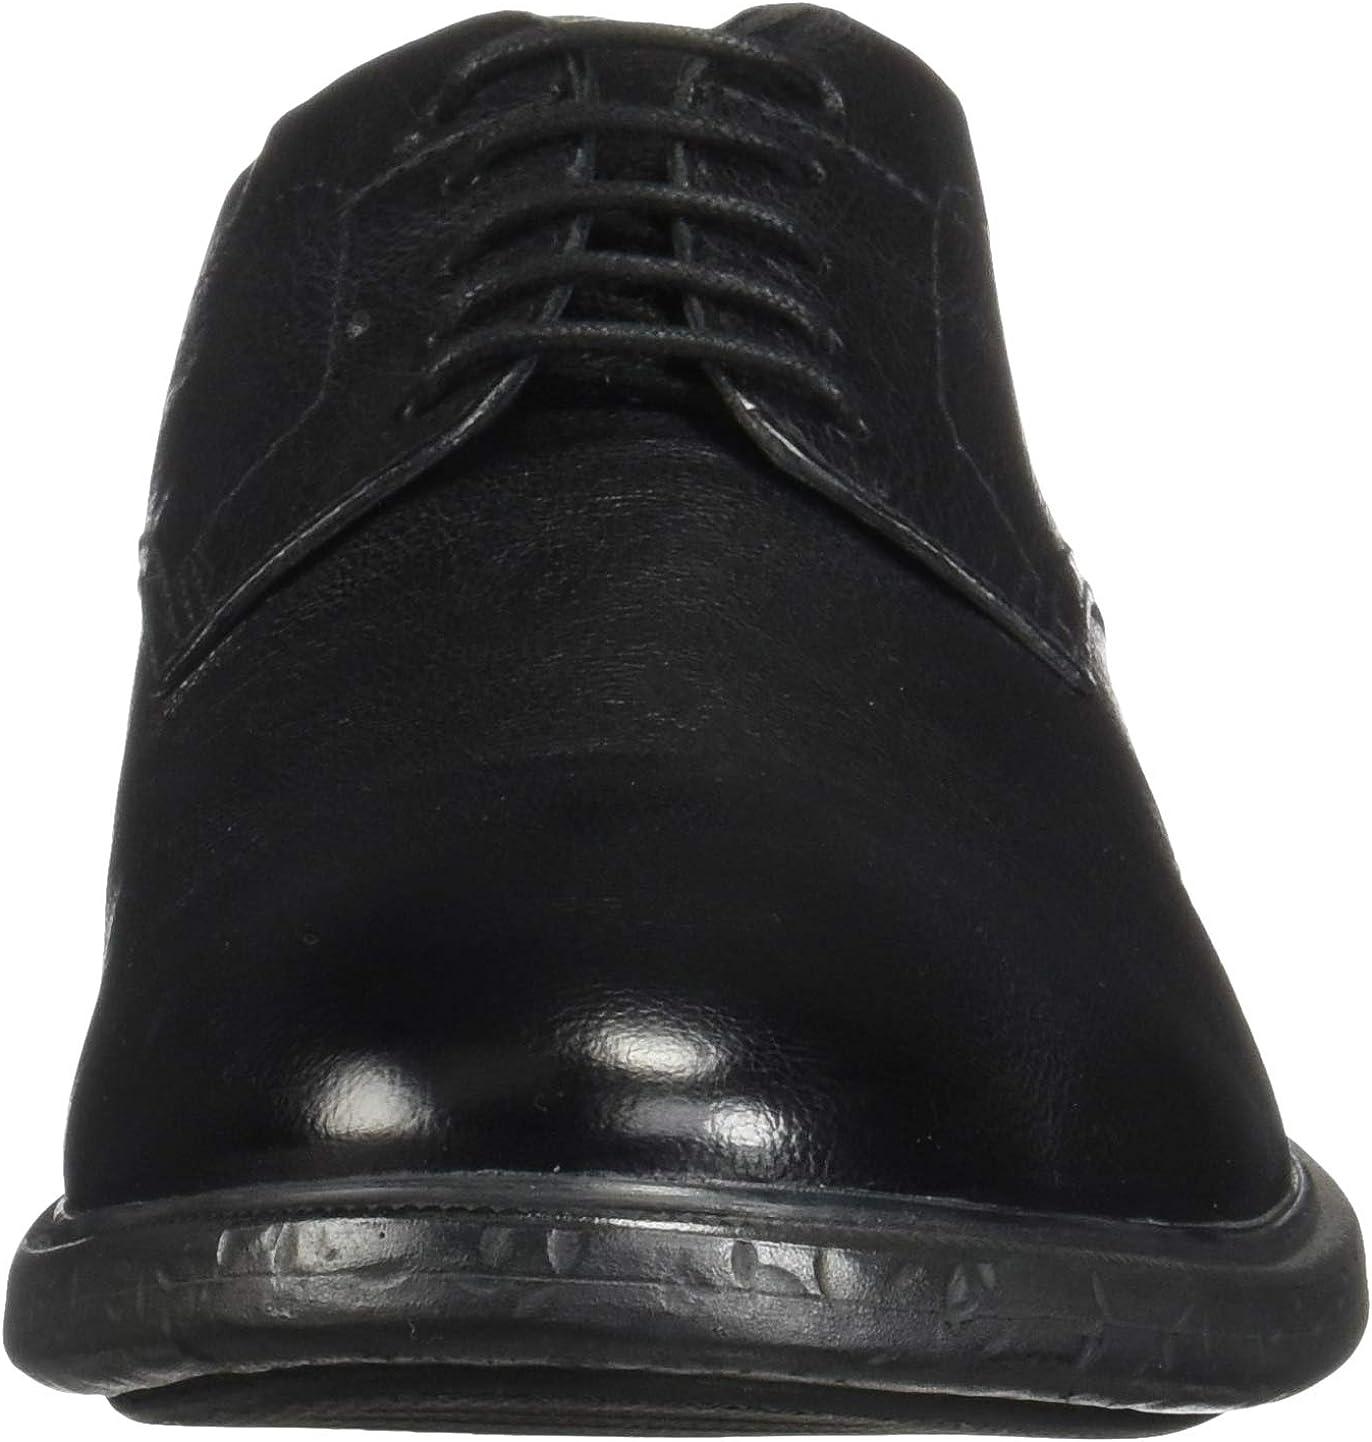 Geox Mens U Terence Black Oxfords & Lace Ups Plain Toe Shoes 11